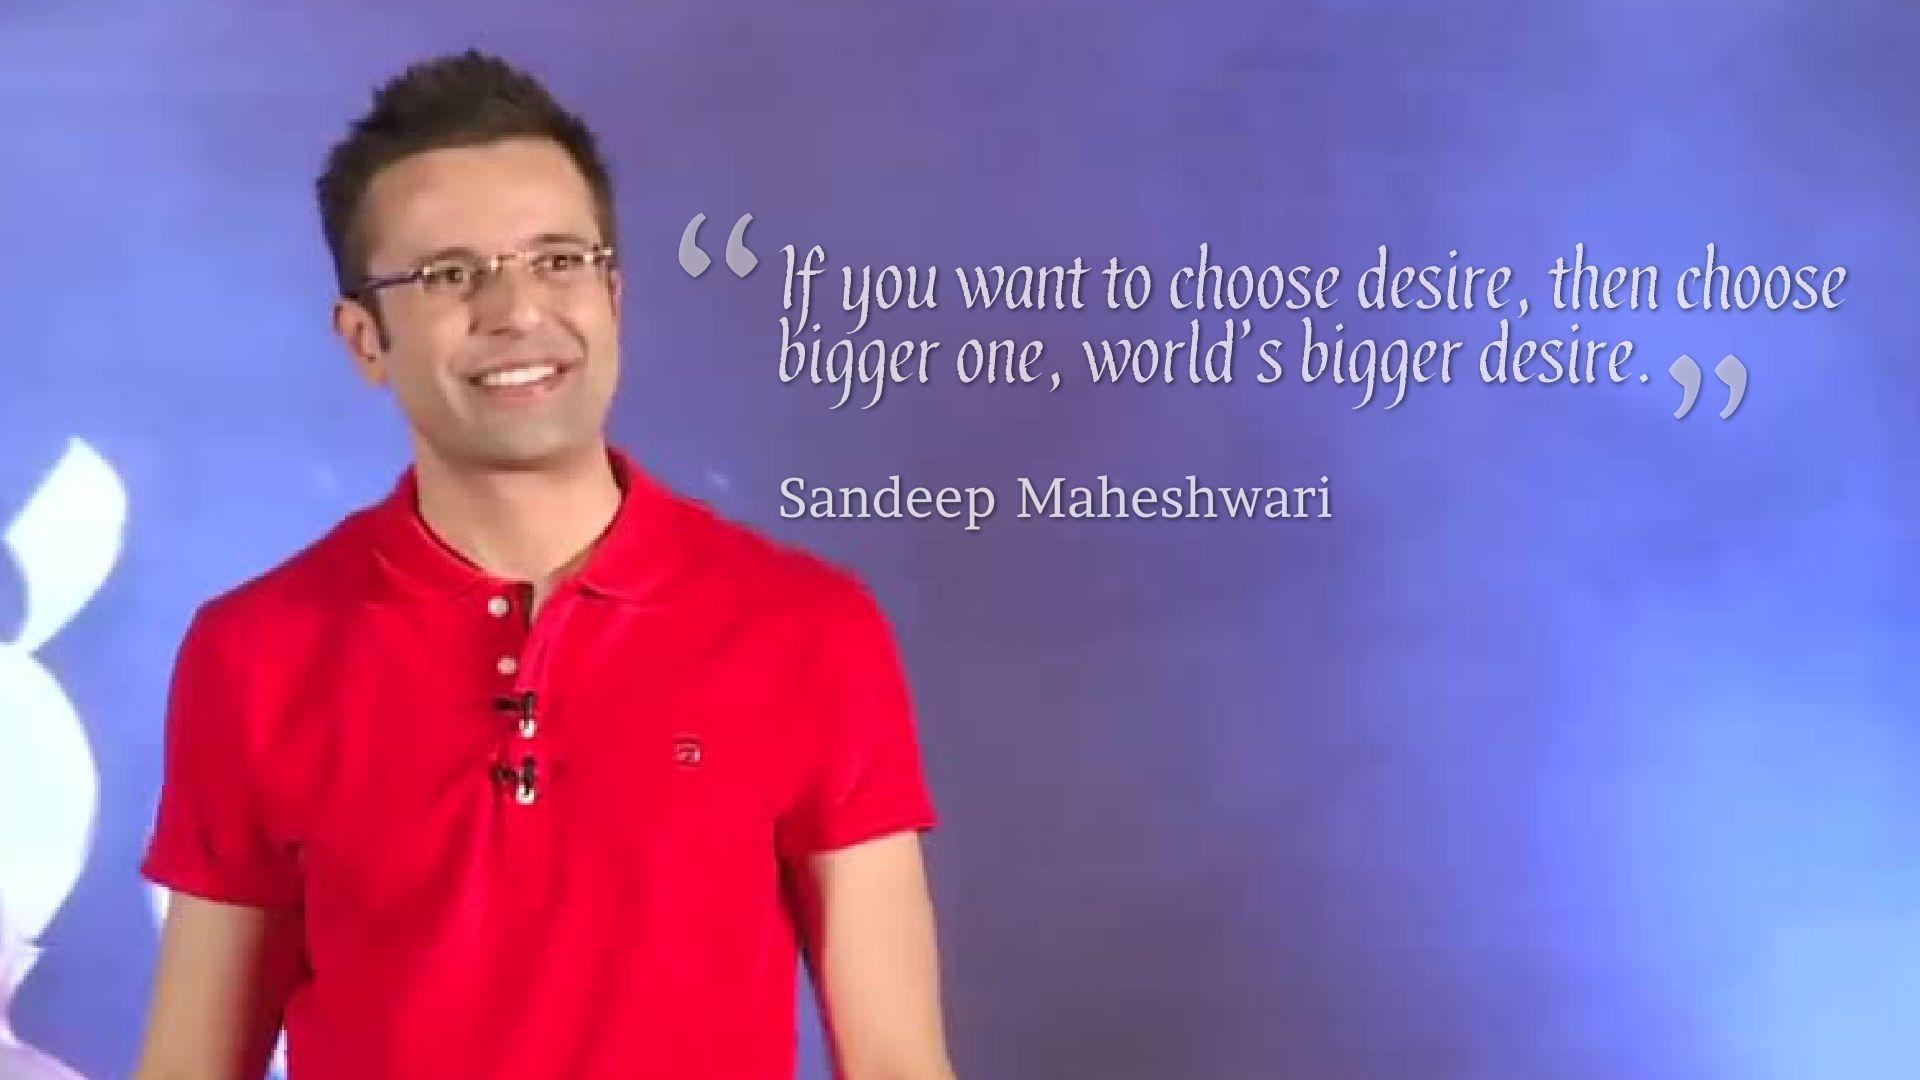 Sandeep Maheshwari Quotes Wallpapers HD Backgrounds